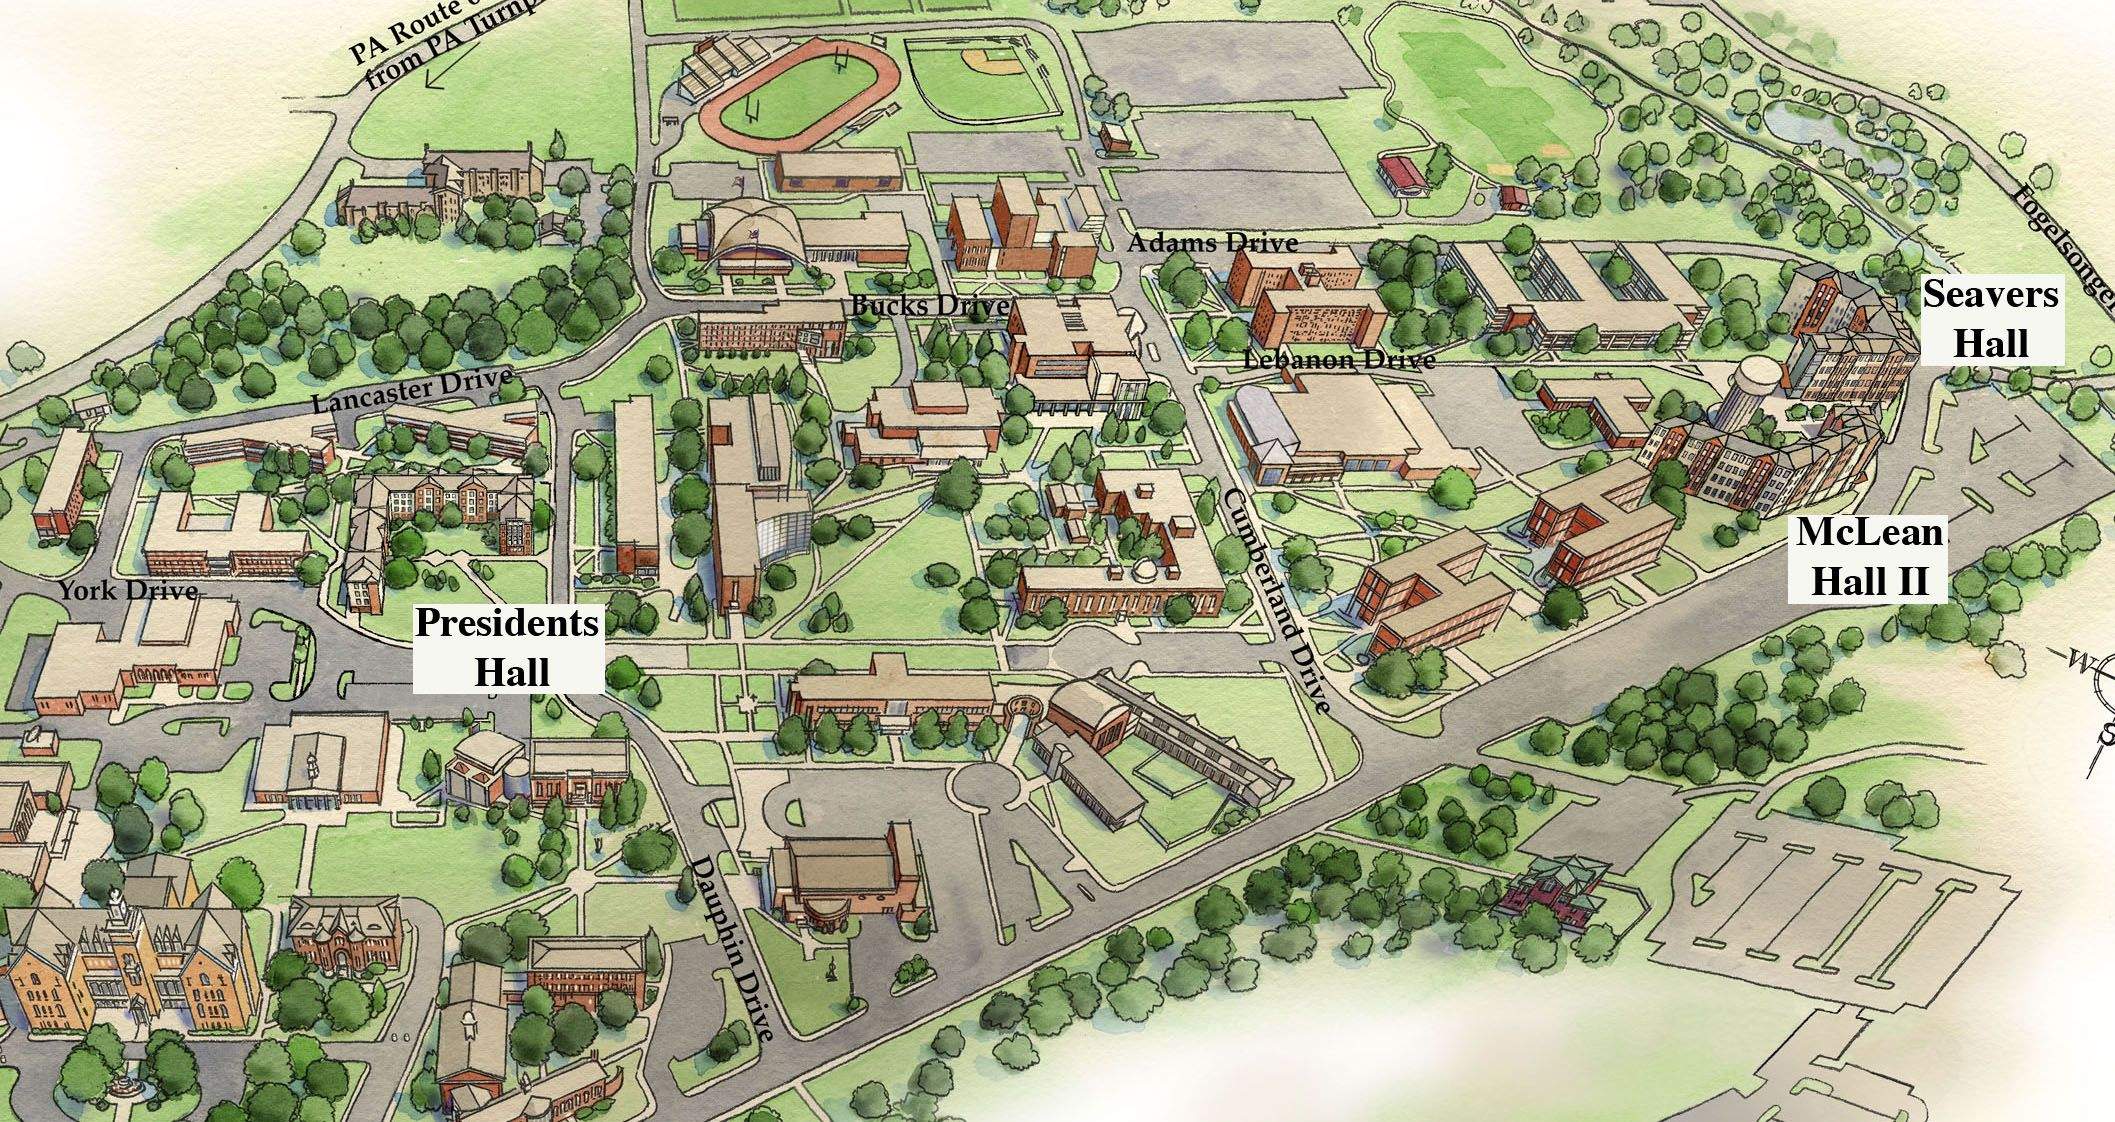 Susquehanna Campus Map.Shippensburg University Residence Halls Explore Campus Pinterest